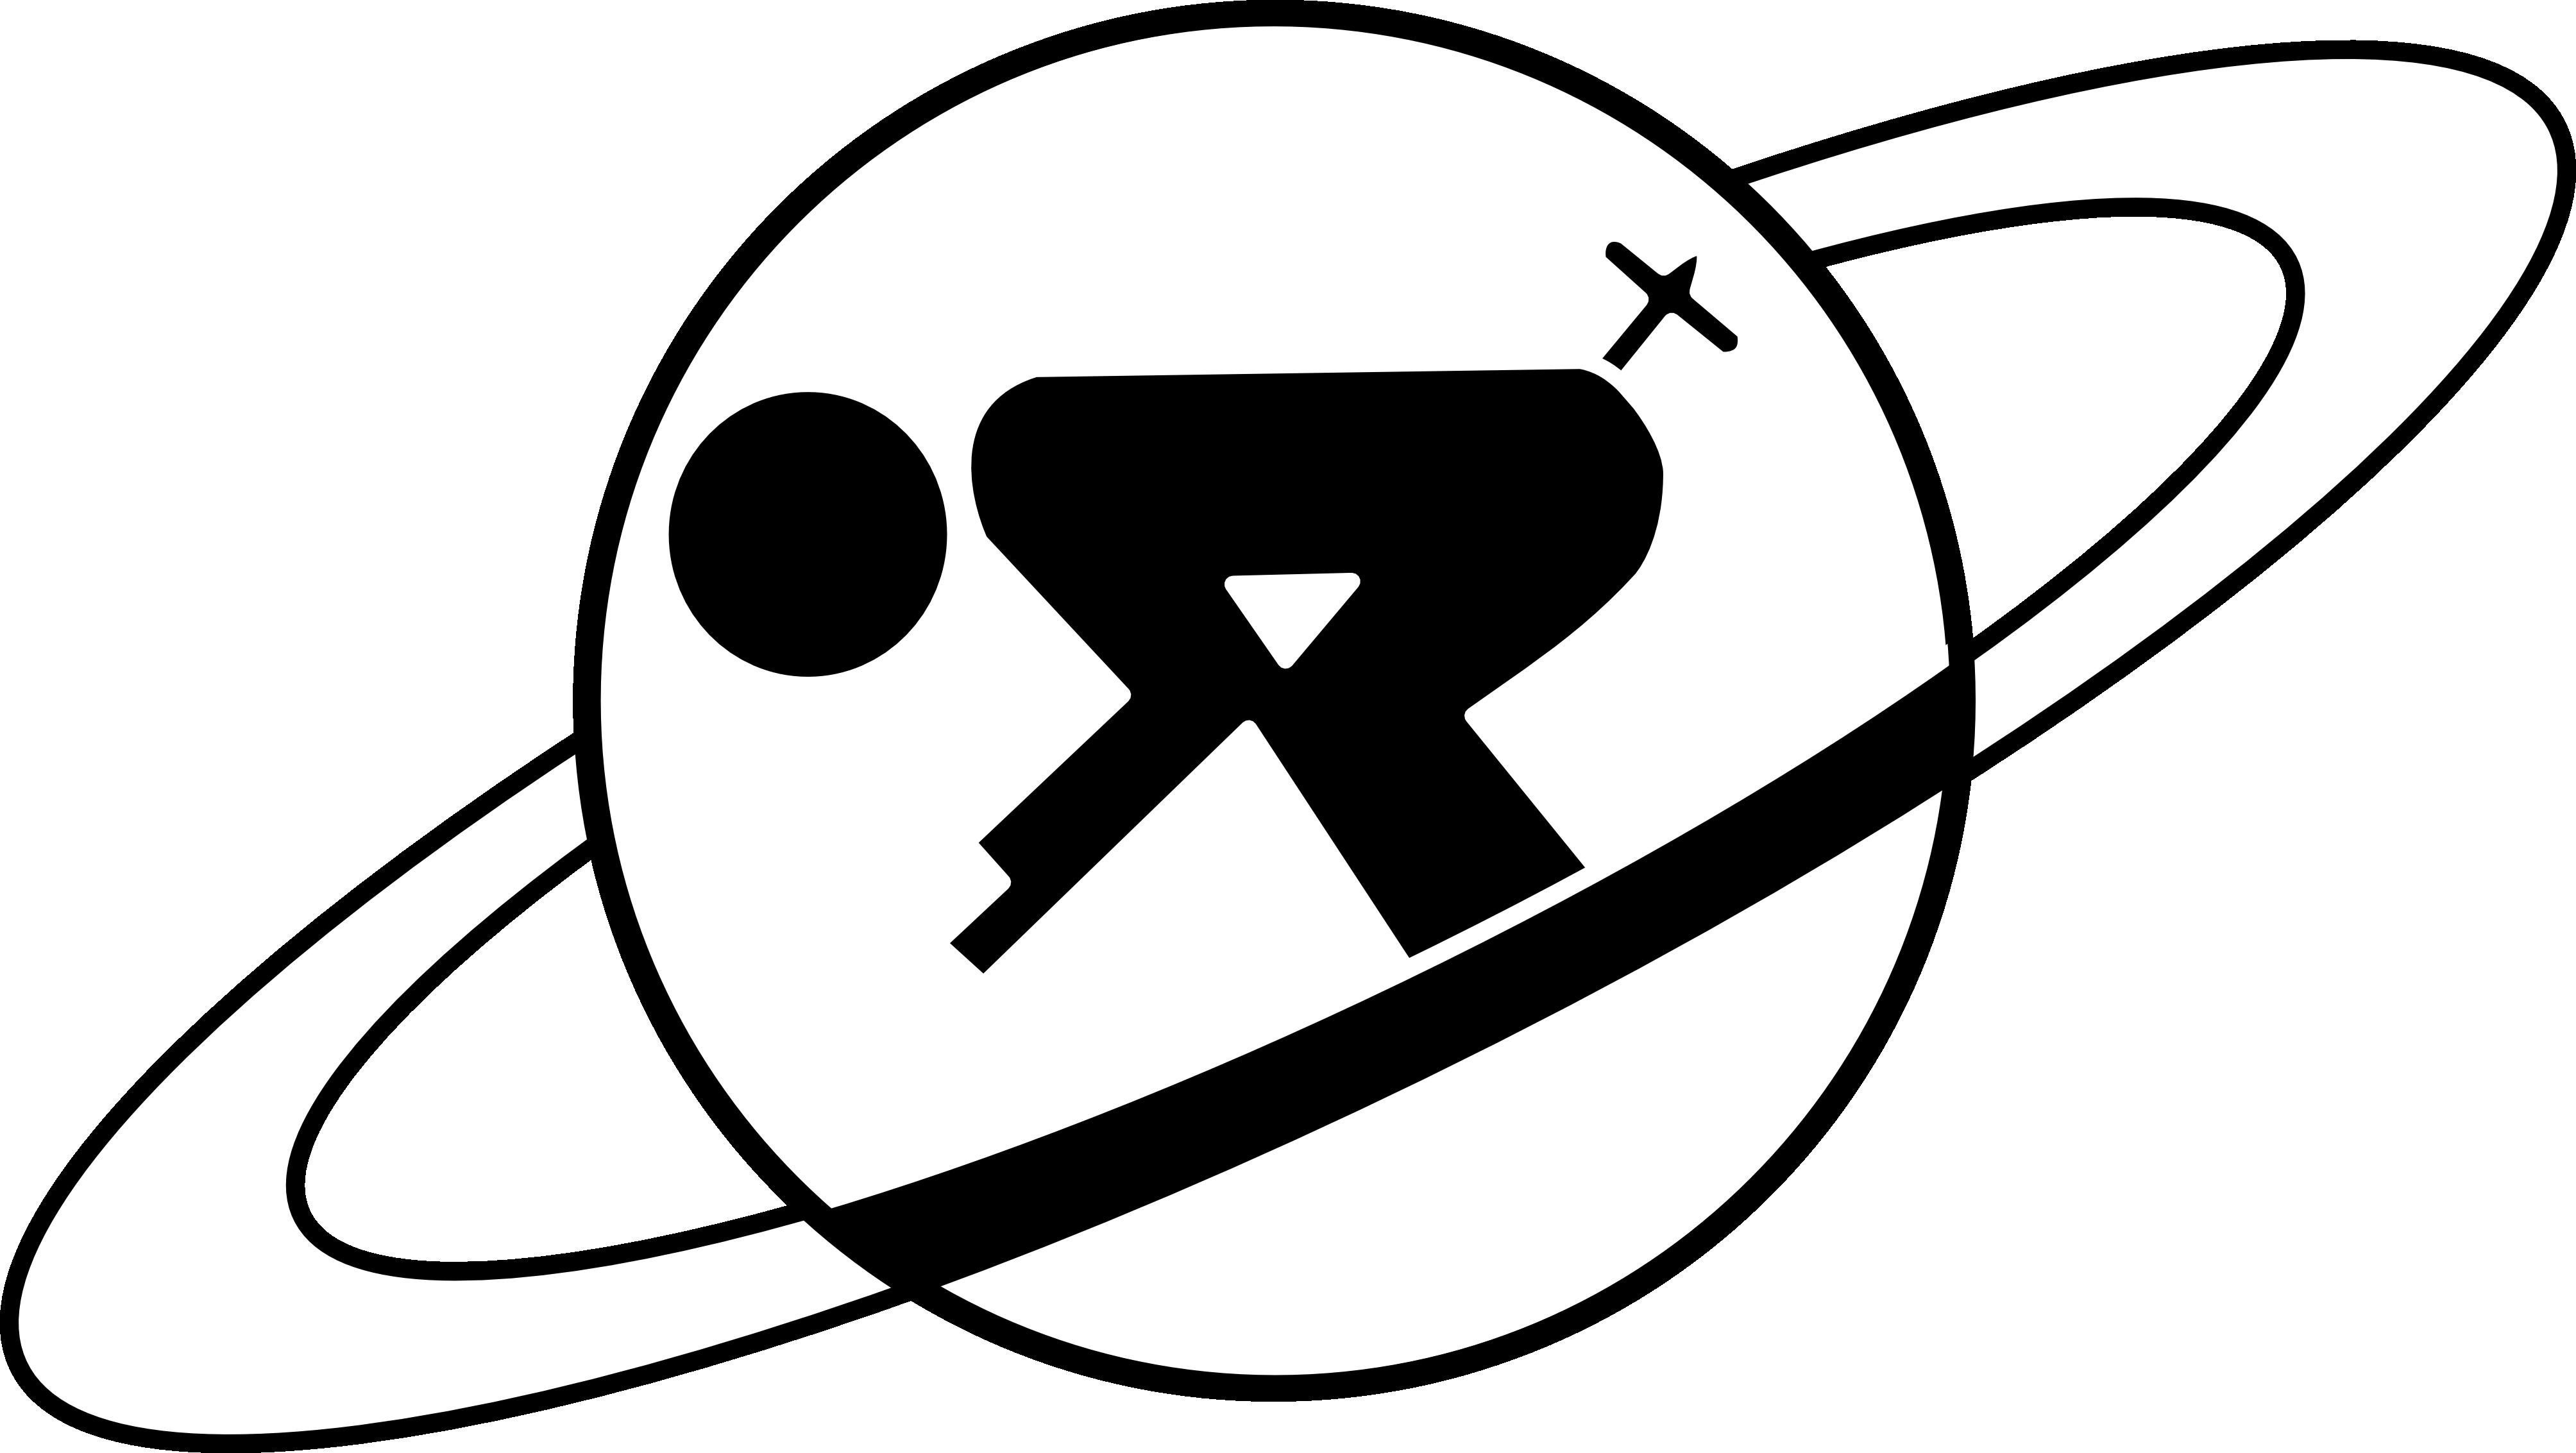 Book club clipart black and white clip art transparent download Club Logos   Lewis Ski Club clip art transparent download